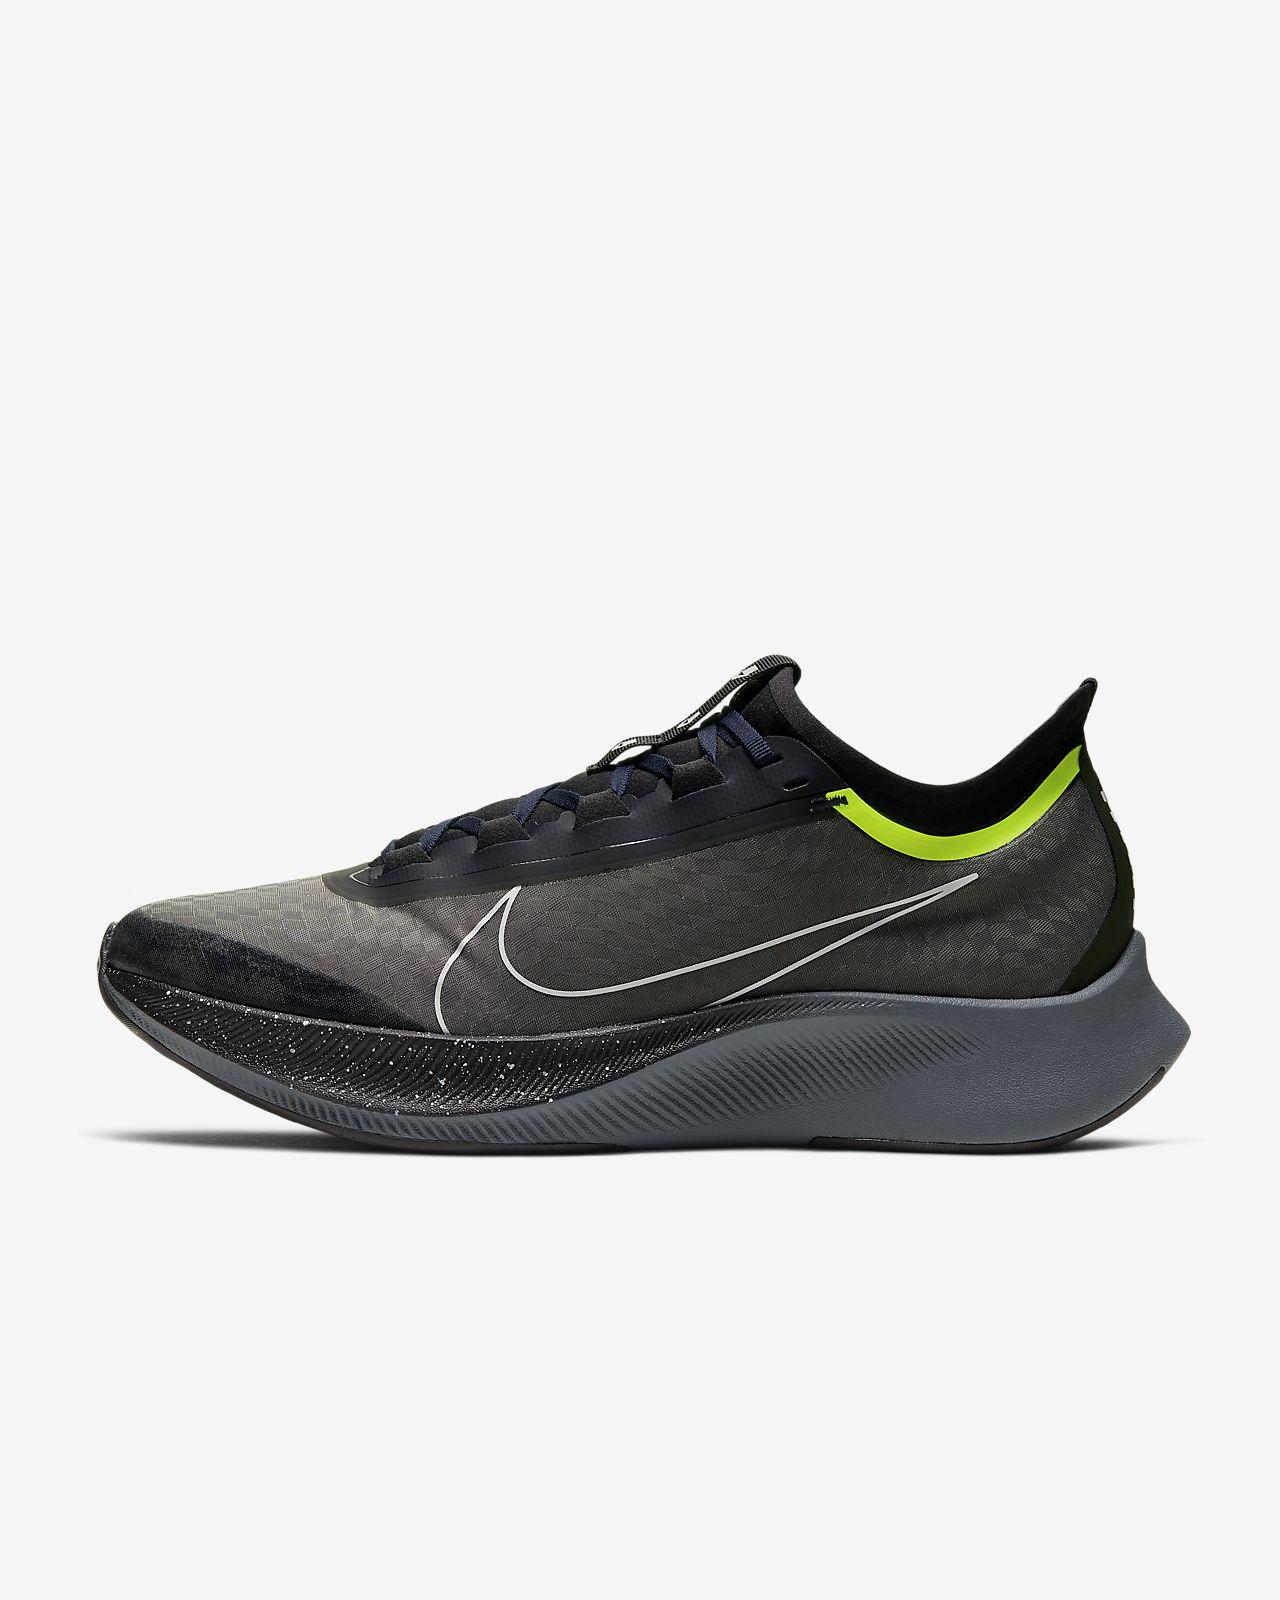 Nike Zoom Fly 3 Premium Men's Running Shoe